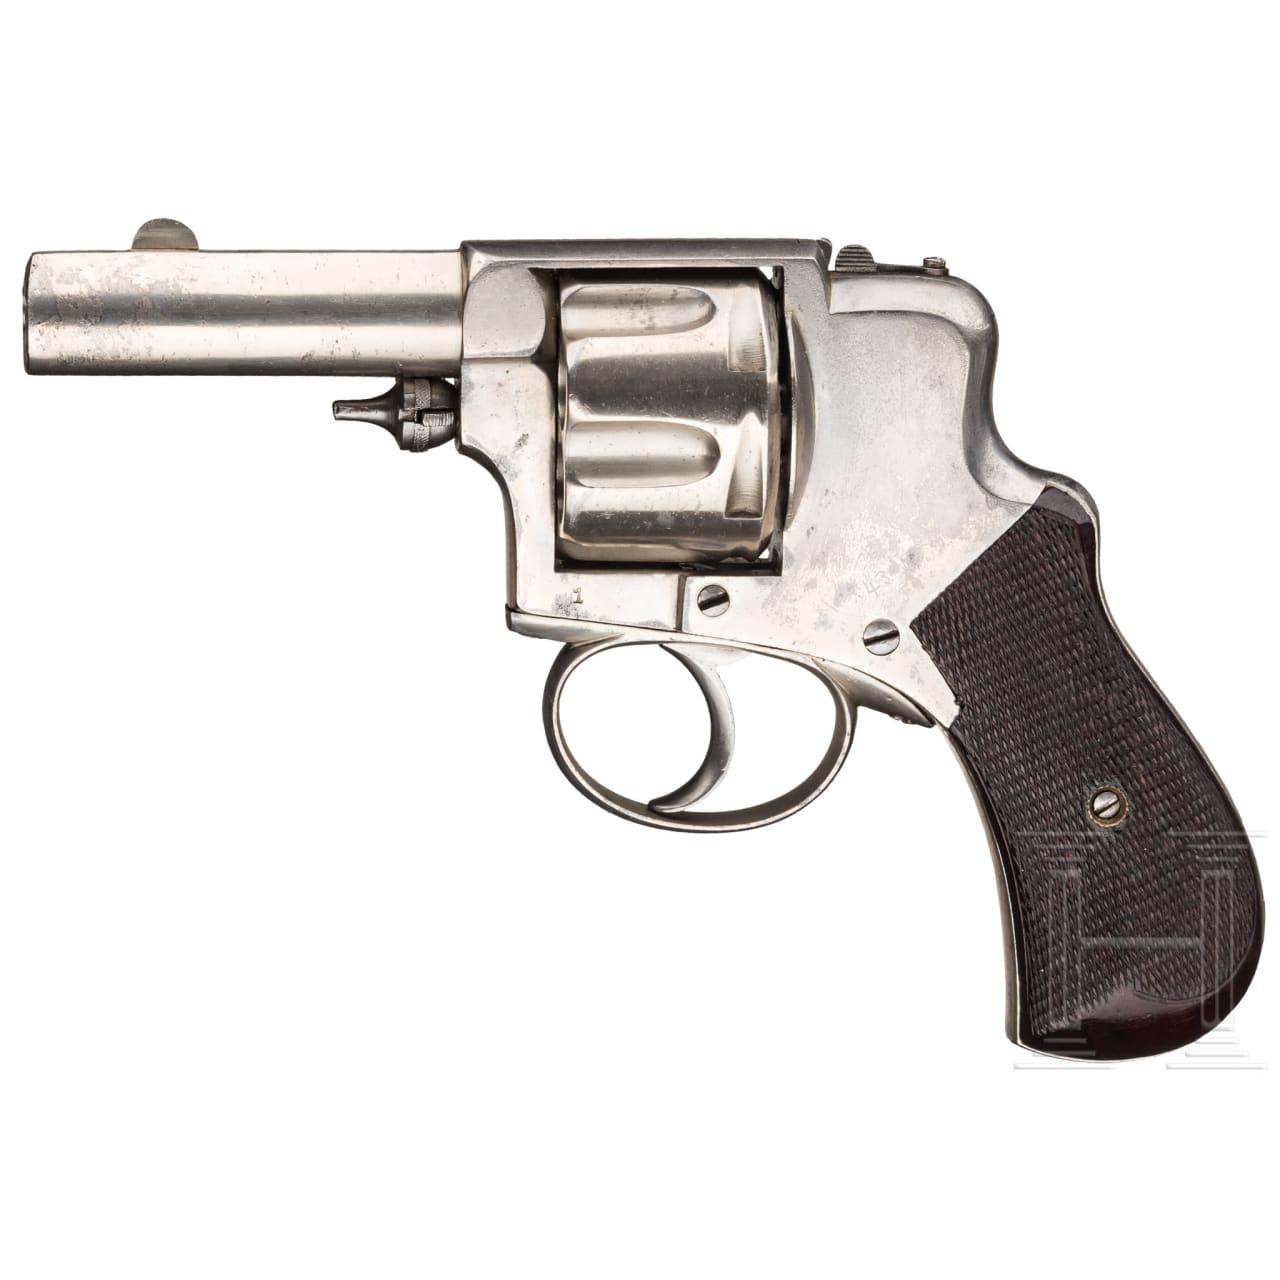 Revolver Hammerless Levaux Liège, Prototyp, um 1880